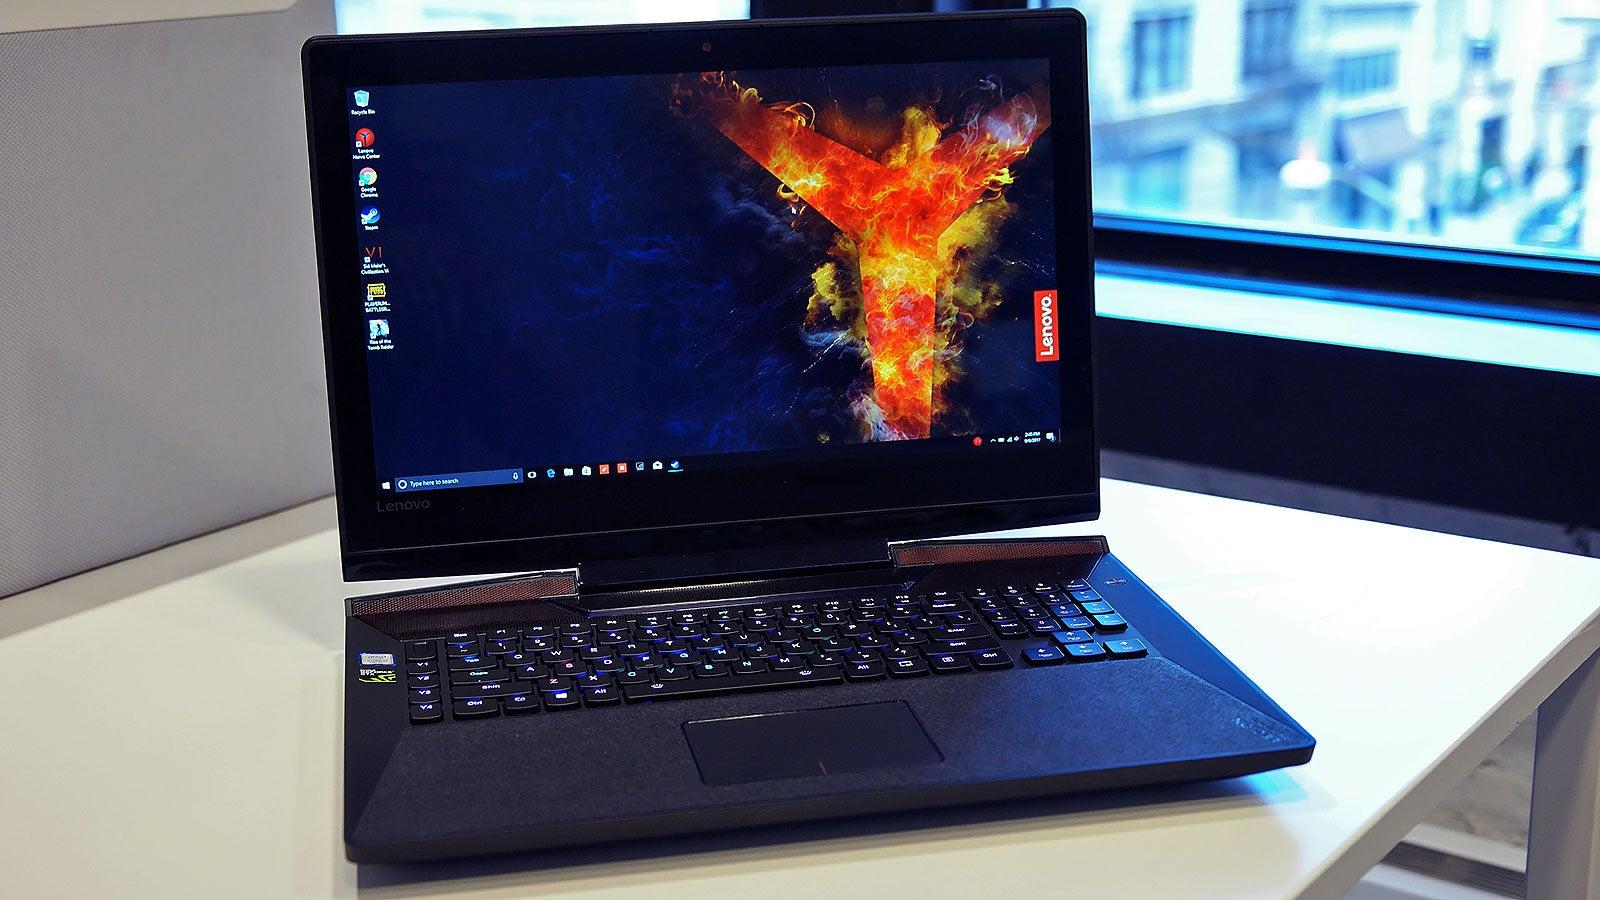 Lenovo S Legion Y920 Gaming Laptop The Gizmodo Review